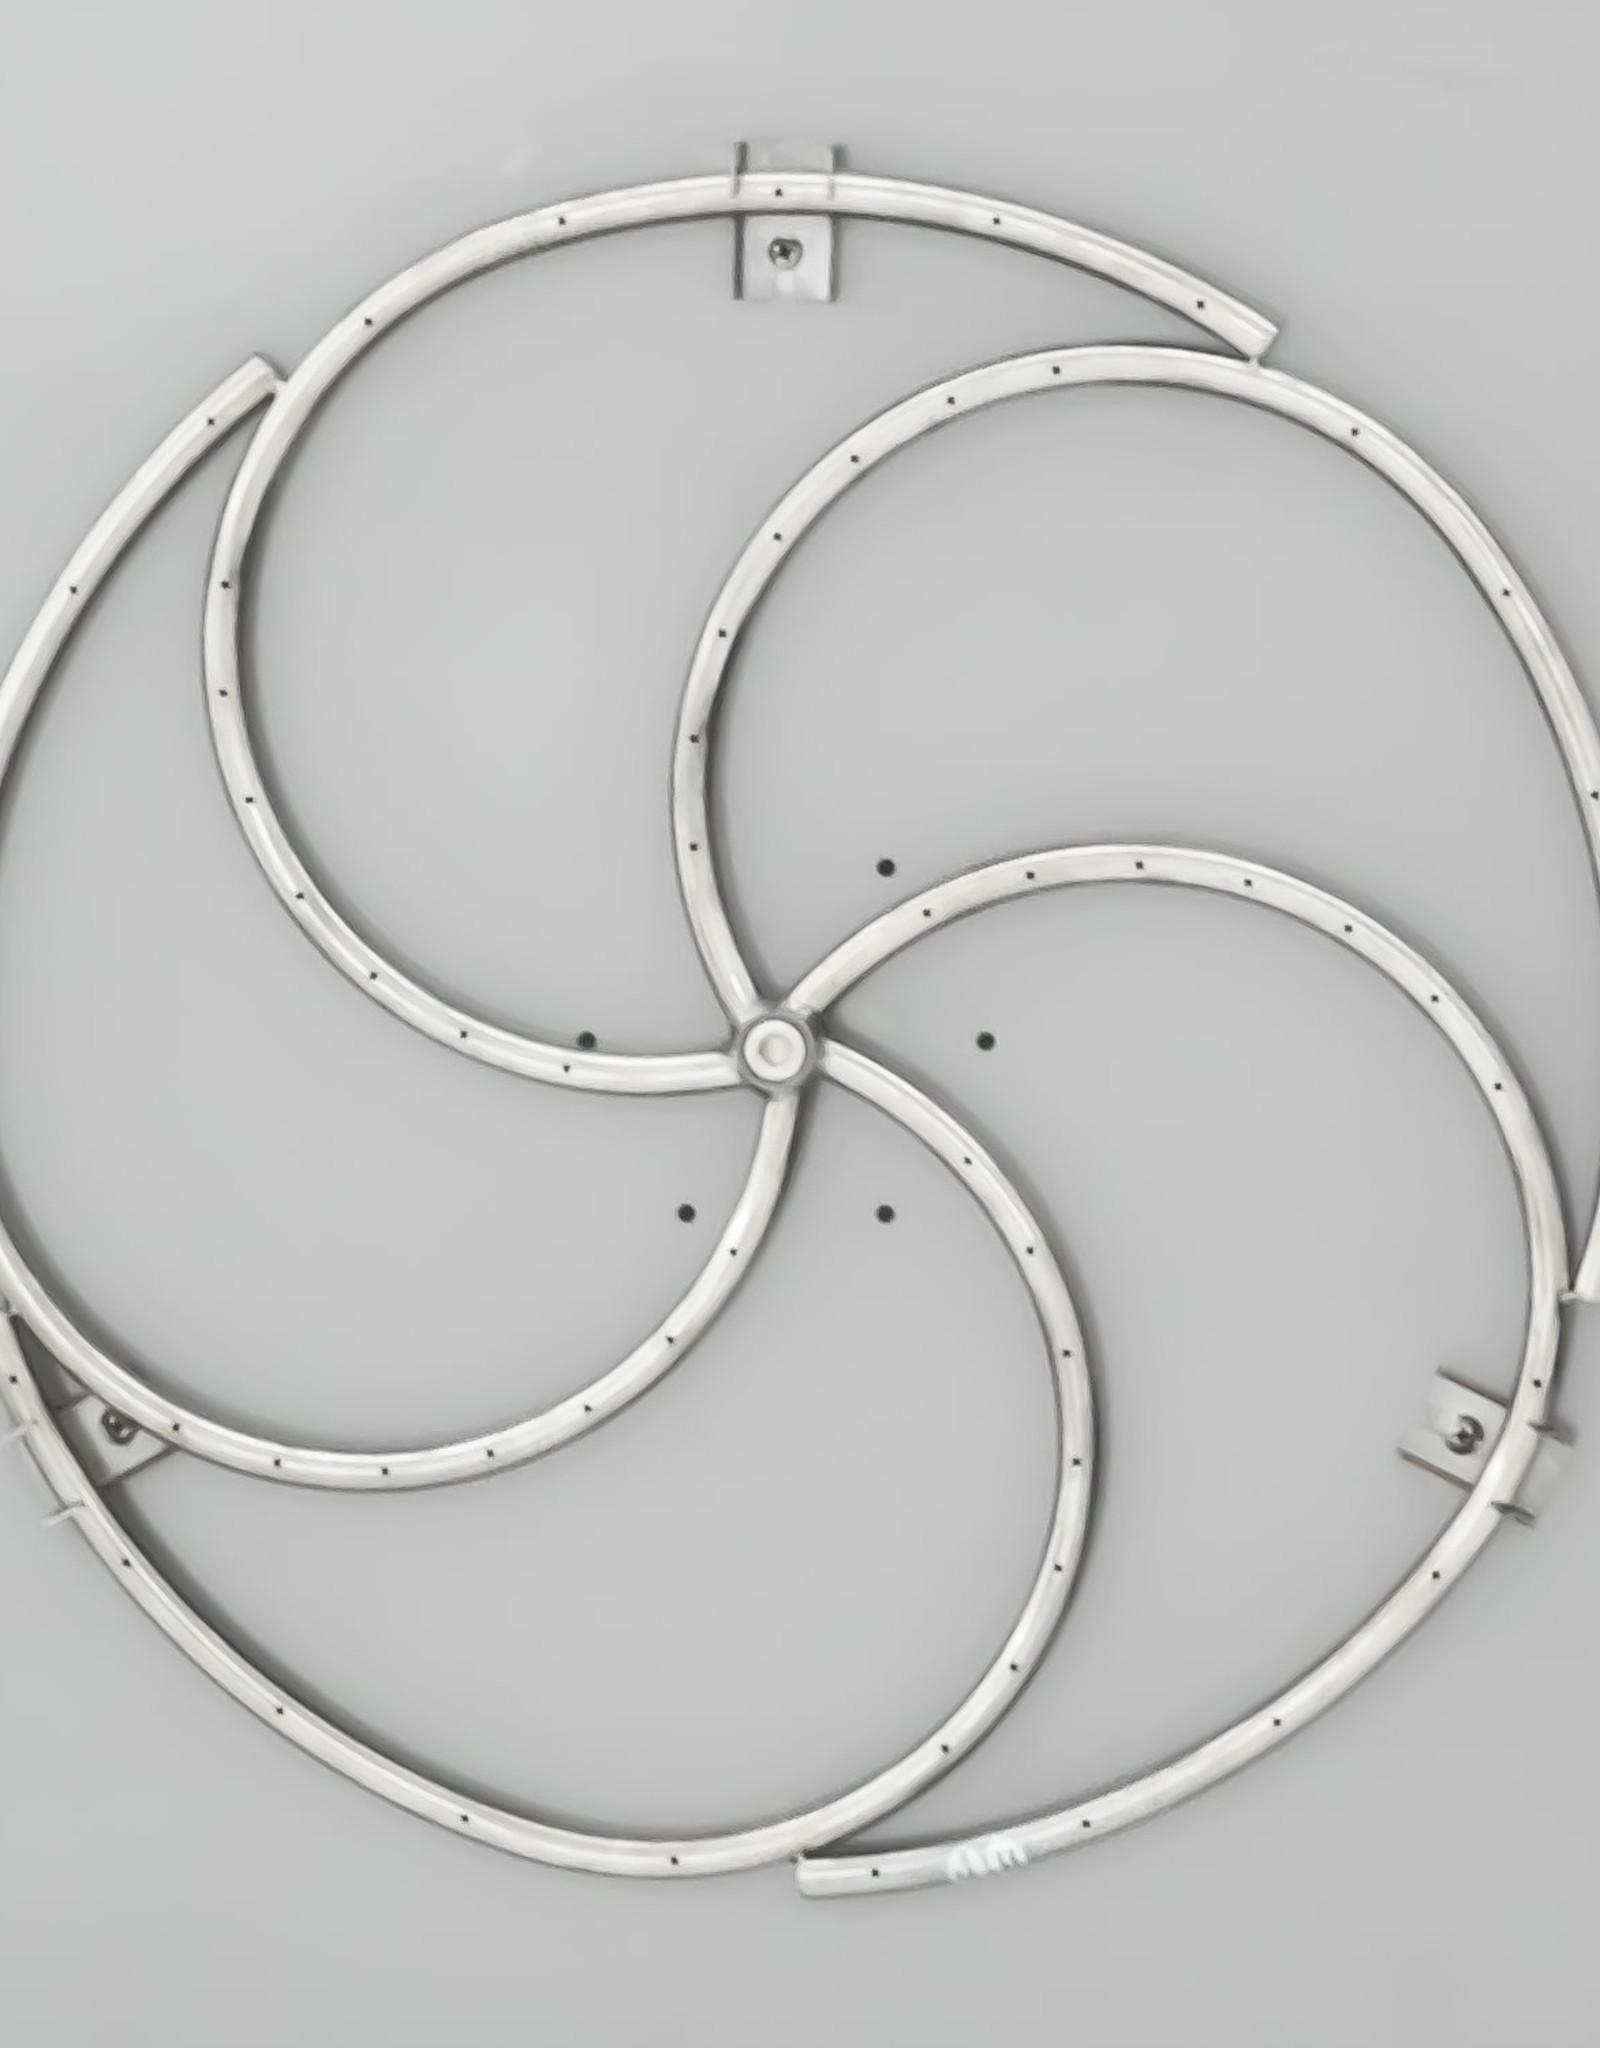 Firenado Firenado 24″ Gas Fire Pit Ring